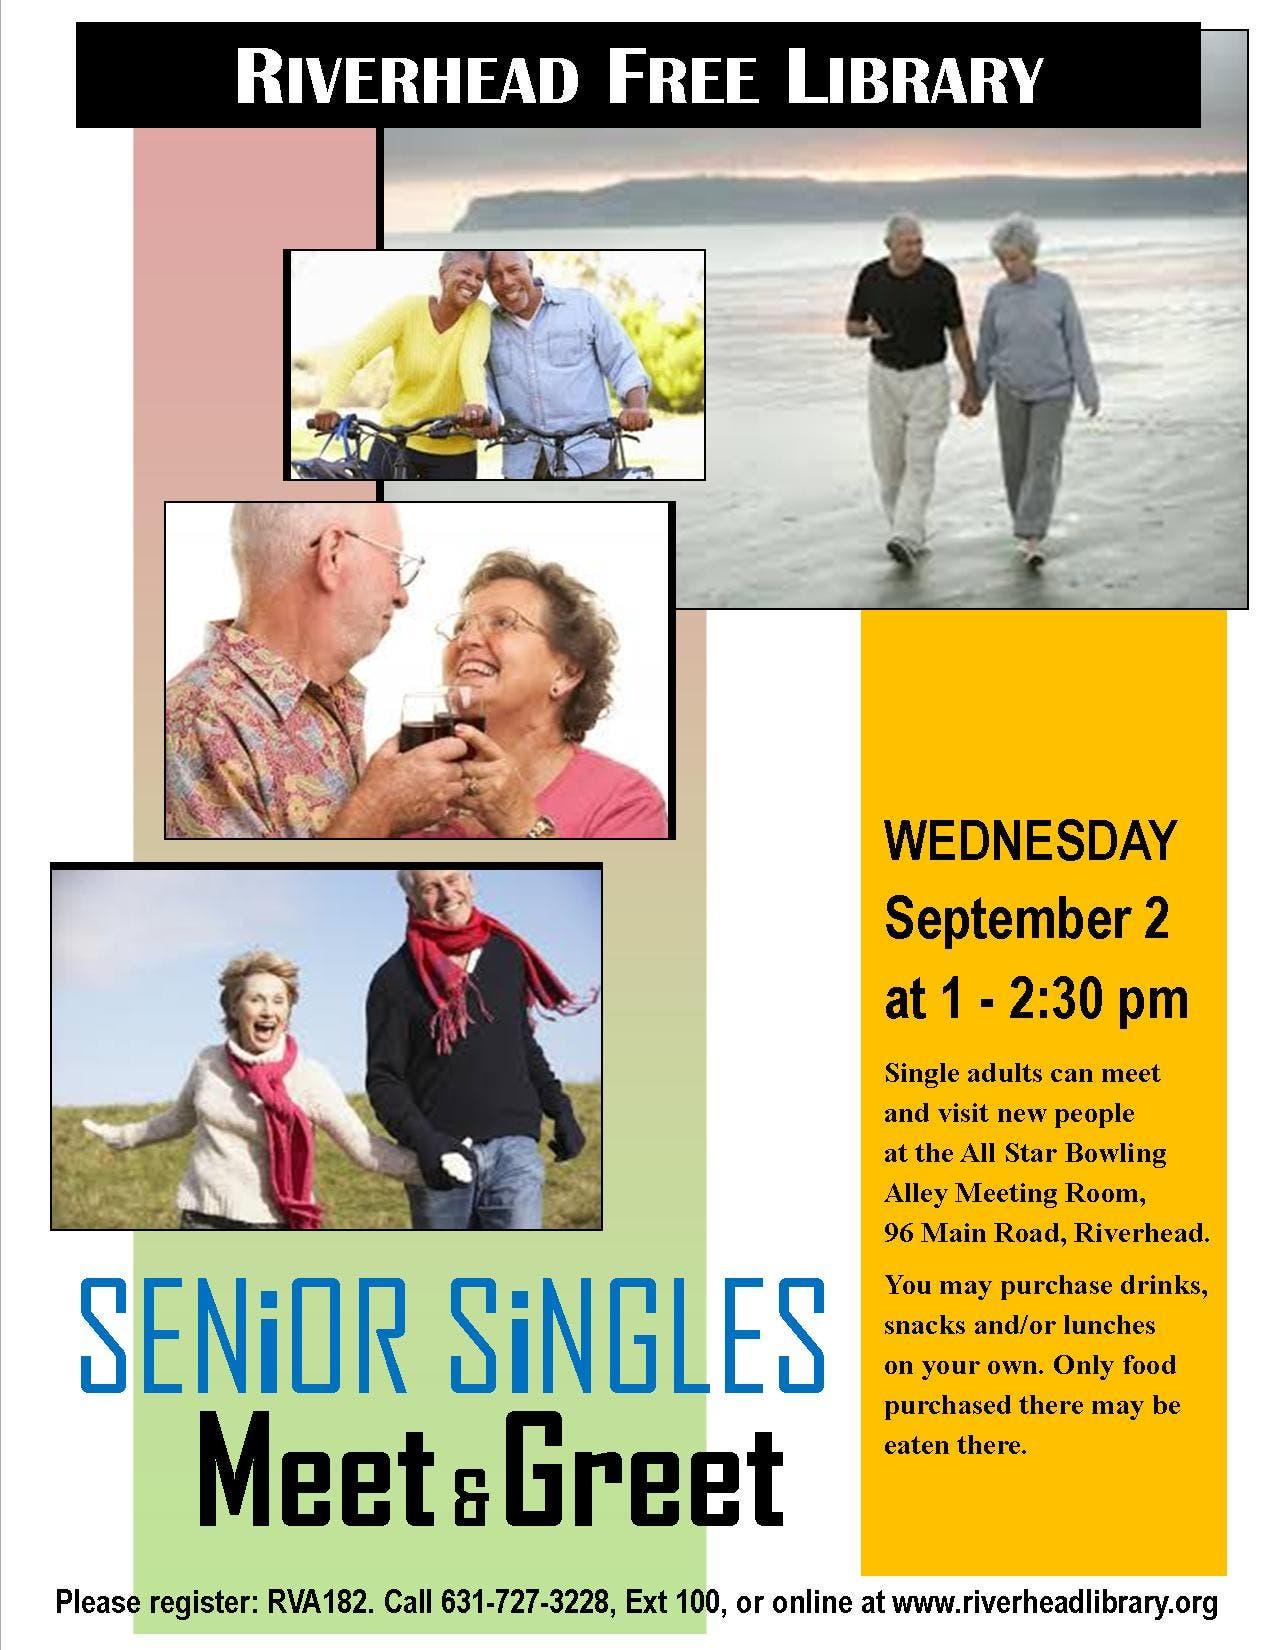 images Senior single meet